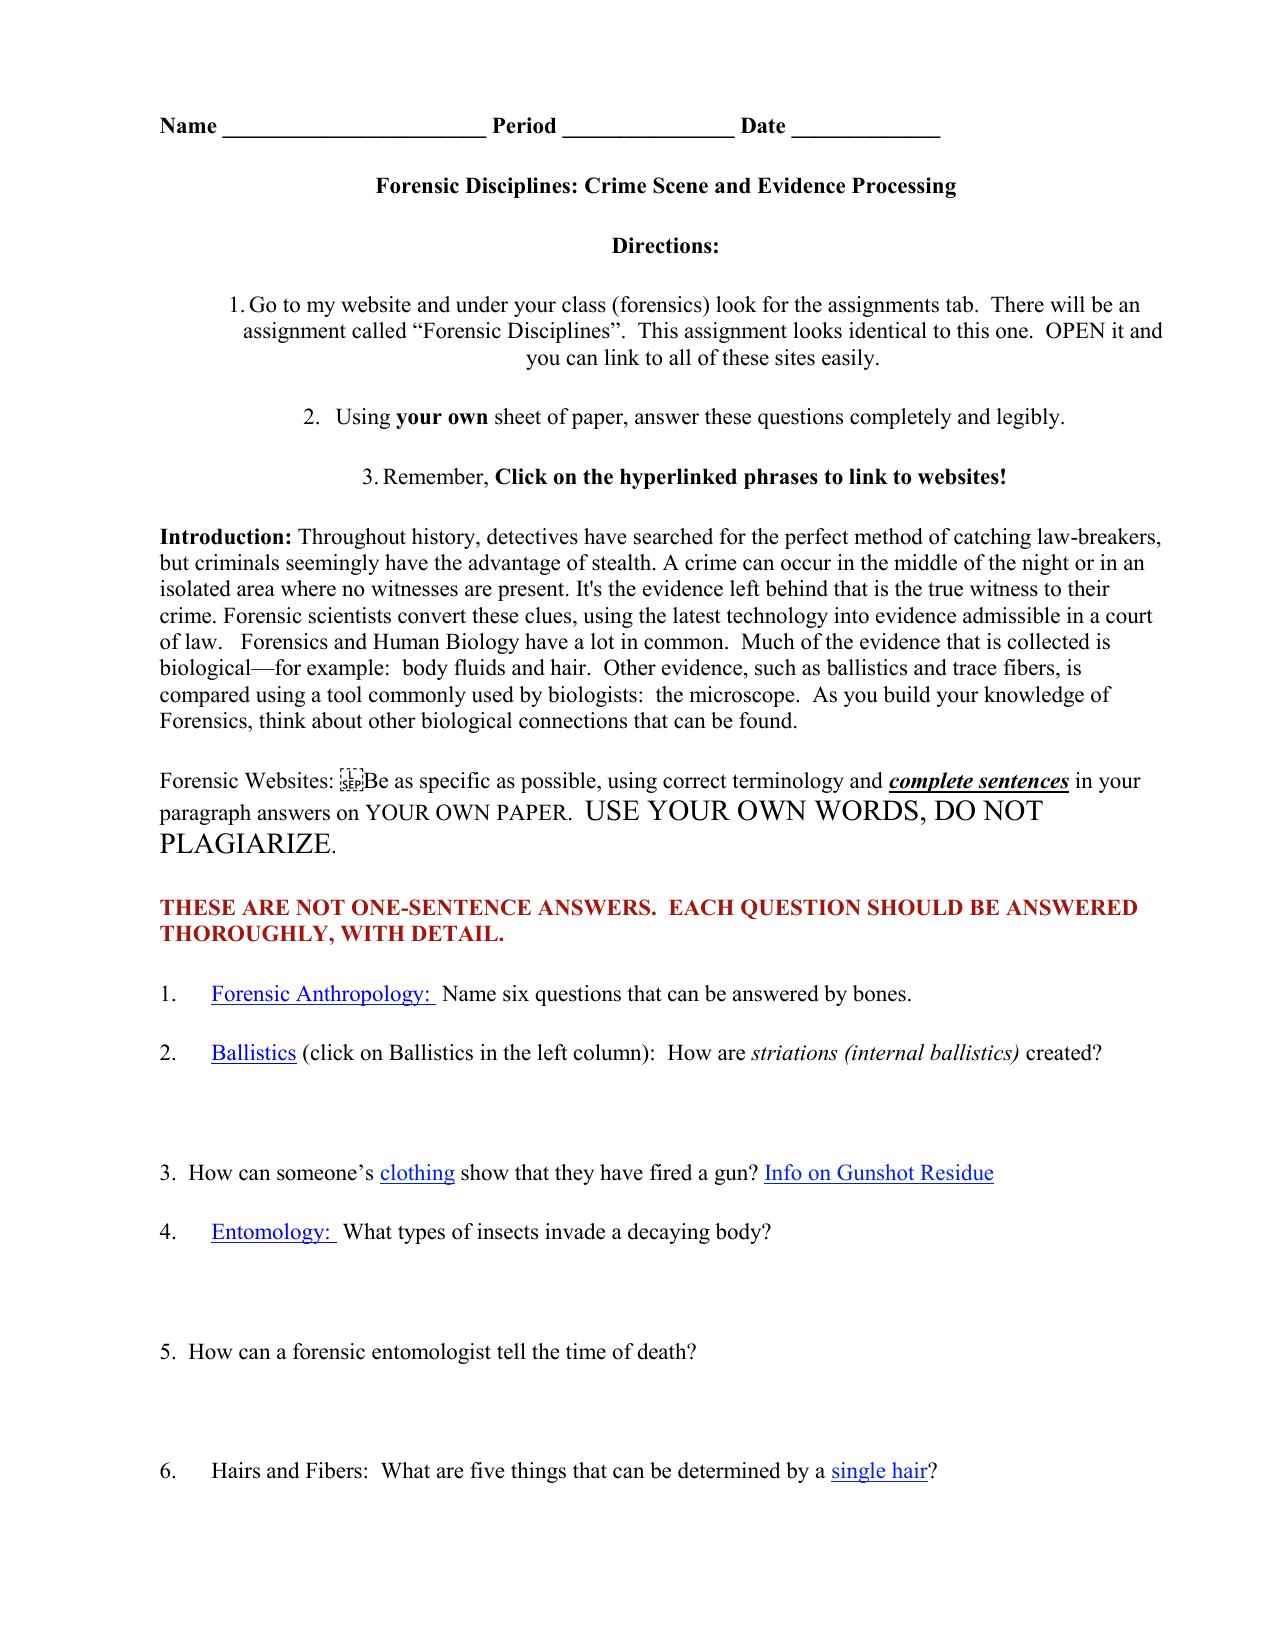 Forensic Disciplines Webquest-0